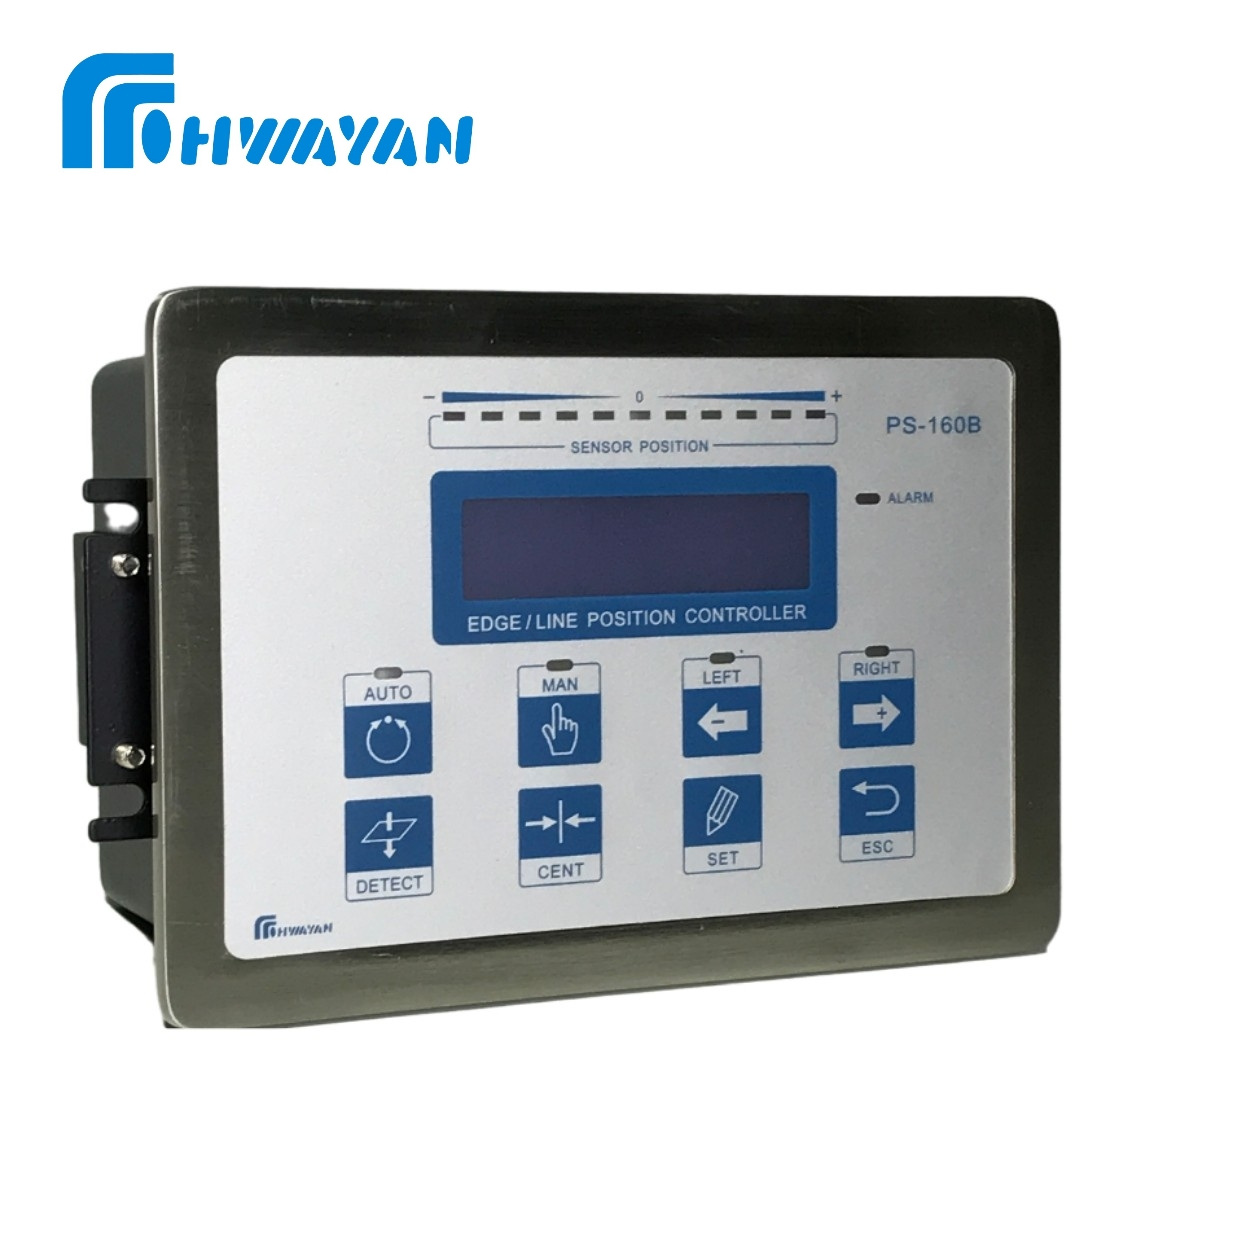 PS-160B 糾偏控制器-糾偏控制器